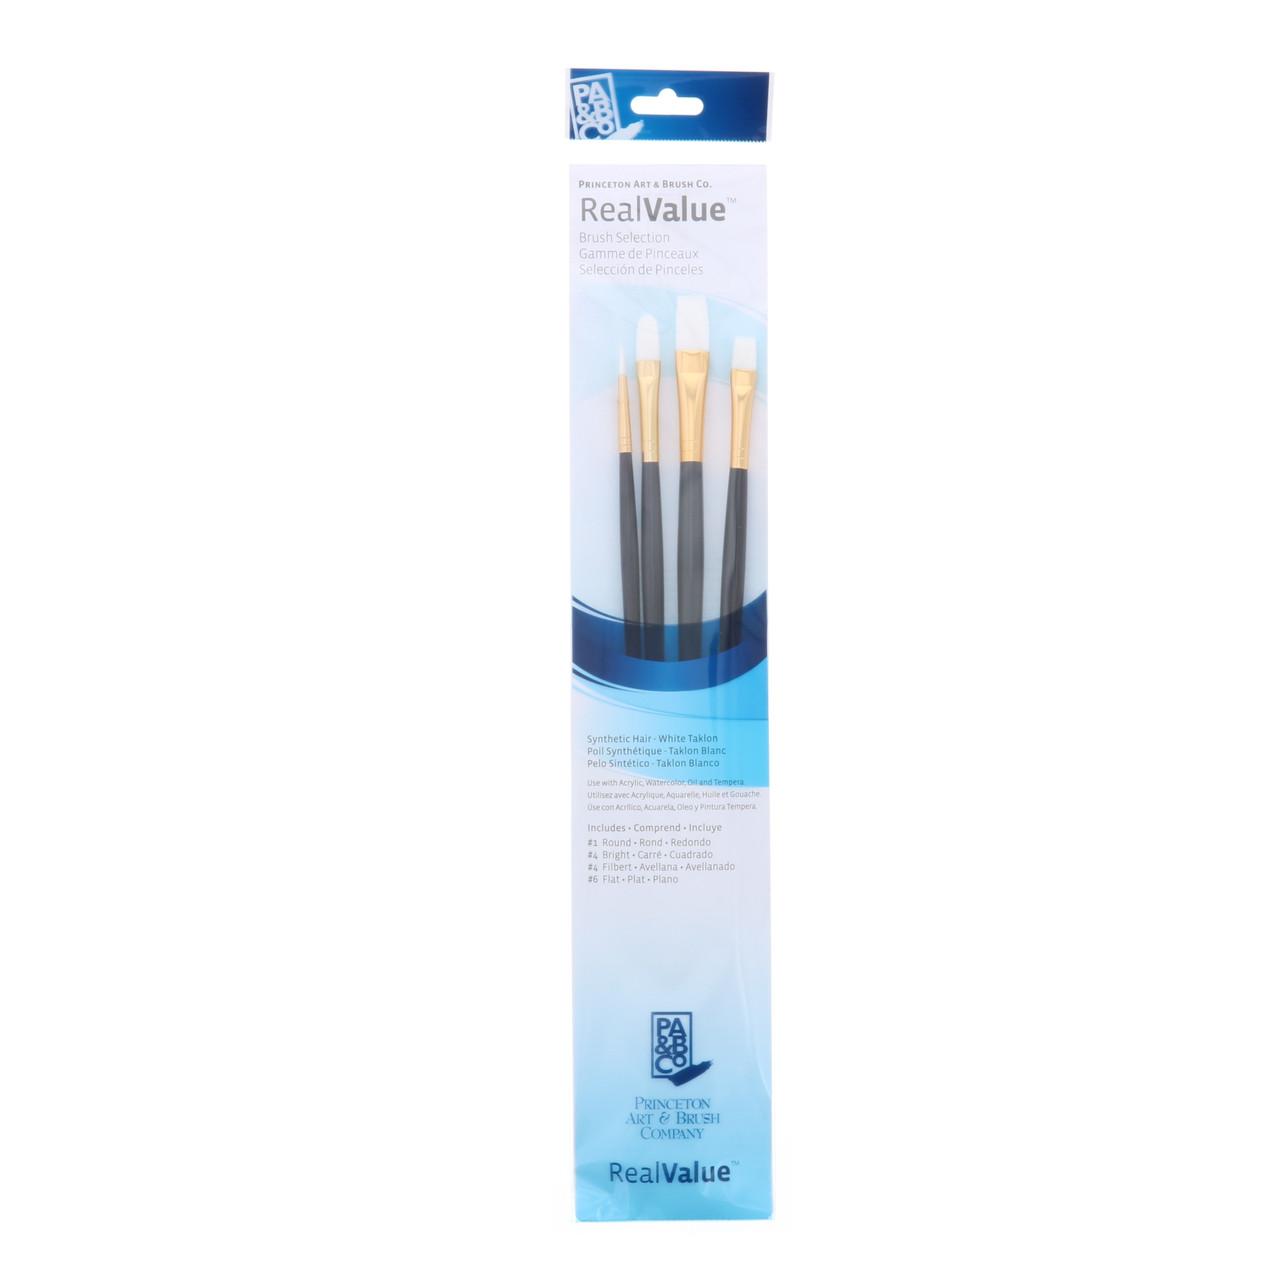 Synthetic White Taklon 4-Brush Set Round 1, Bright 4, Filbert 4, Flat 6